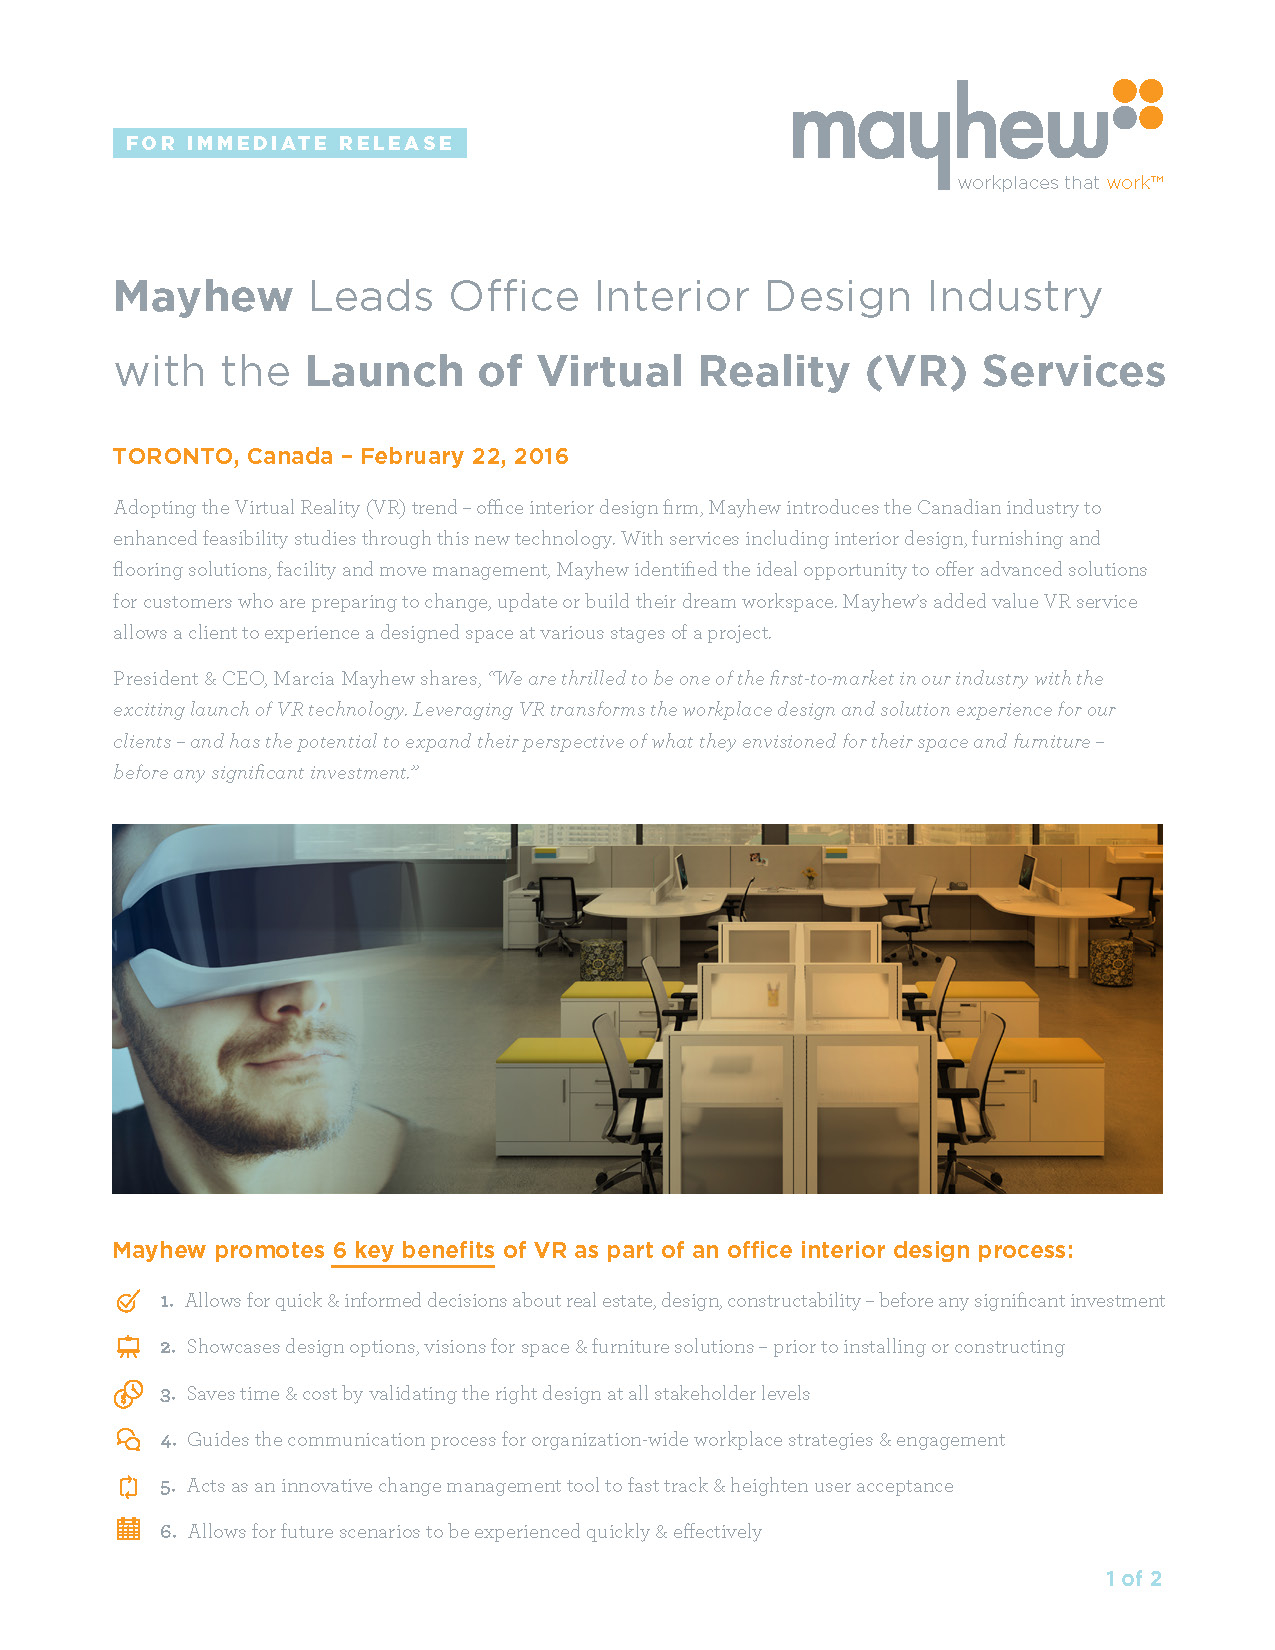 Media Release - Mayhew VR - Feb 2016_Page_1.jpg